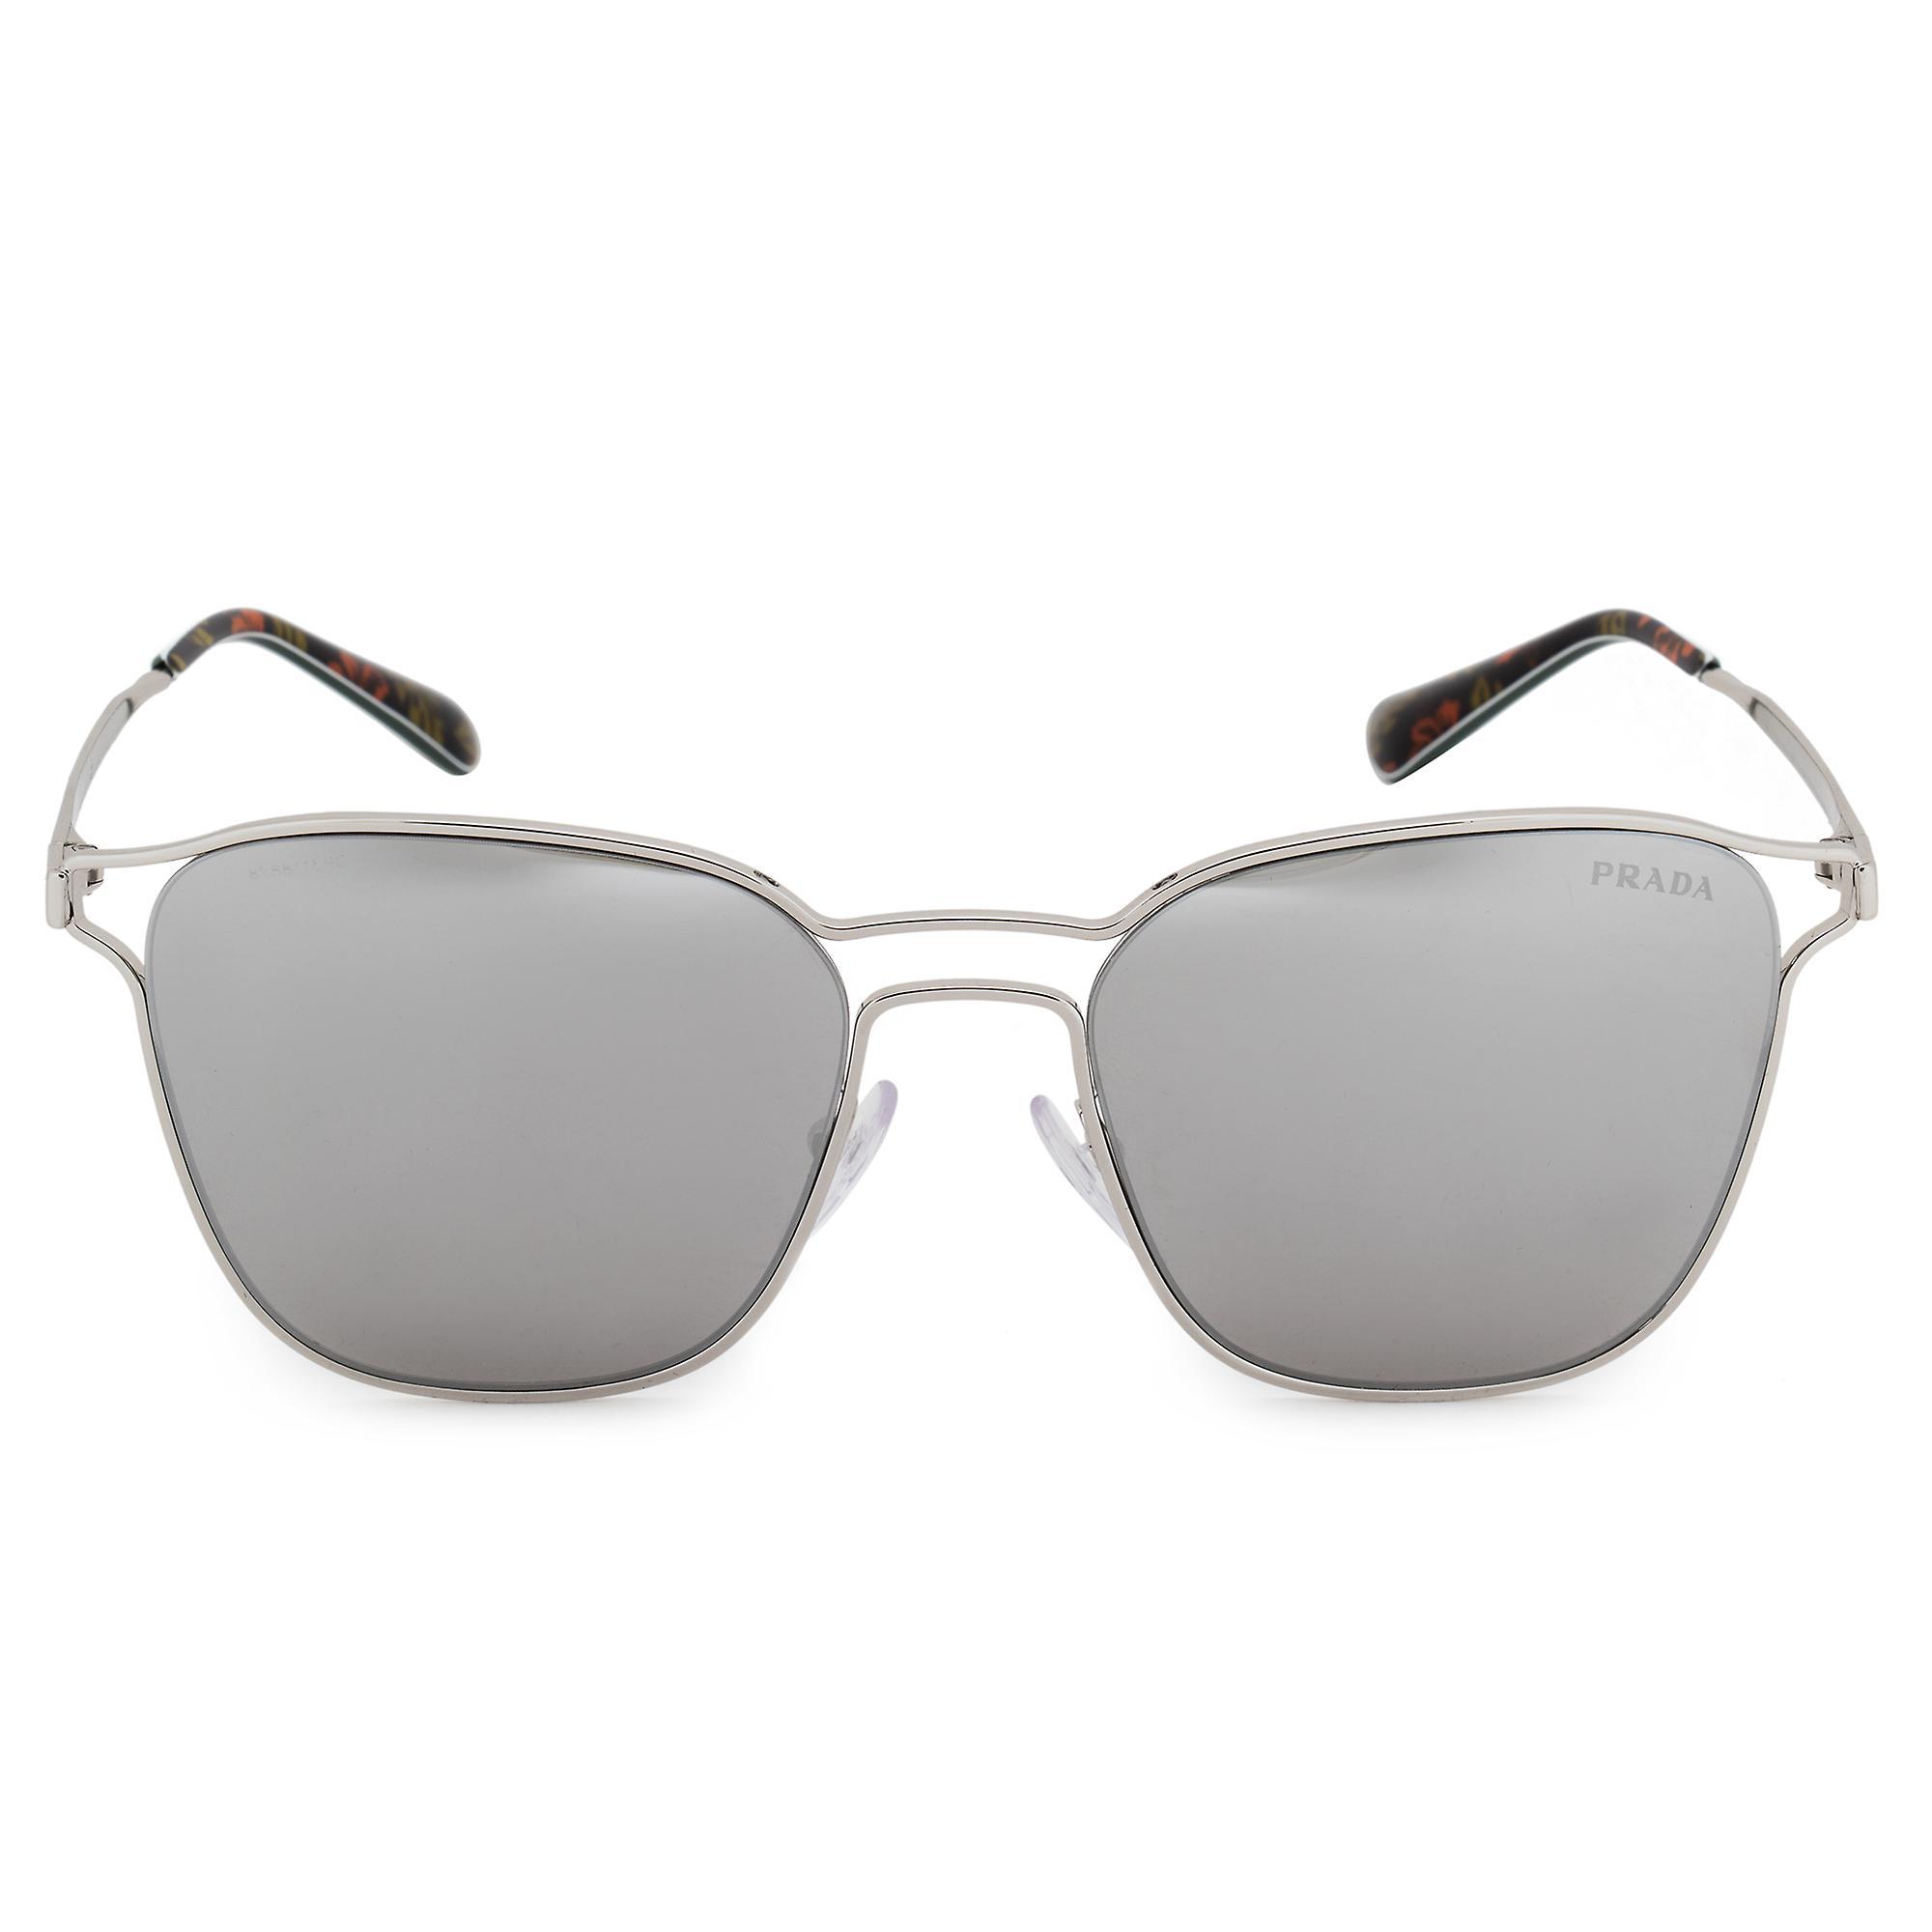 Prada Cinema Square Sunglasses PR54TS 1BC2B0 55